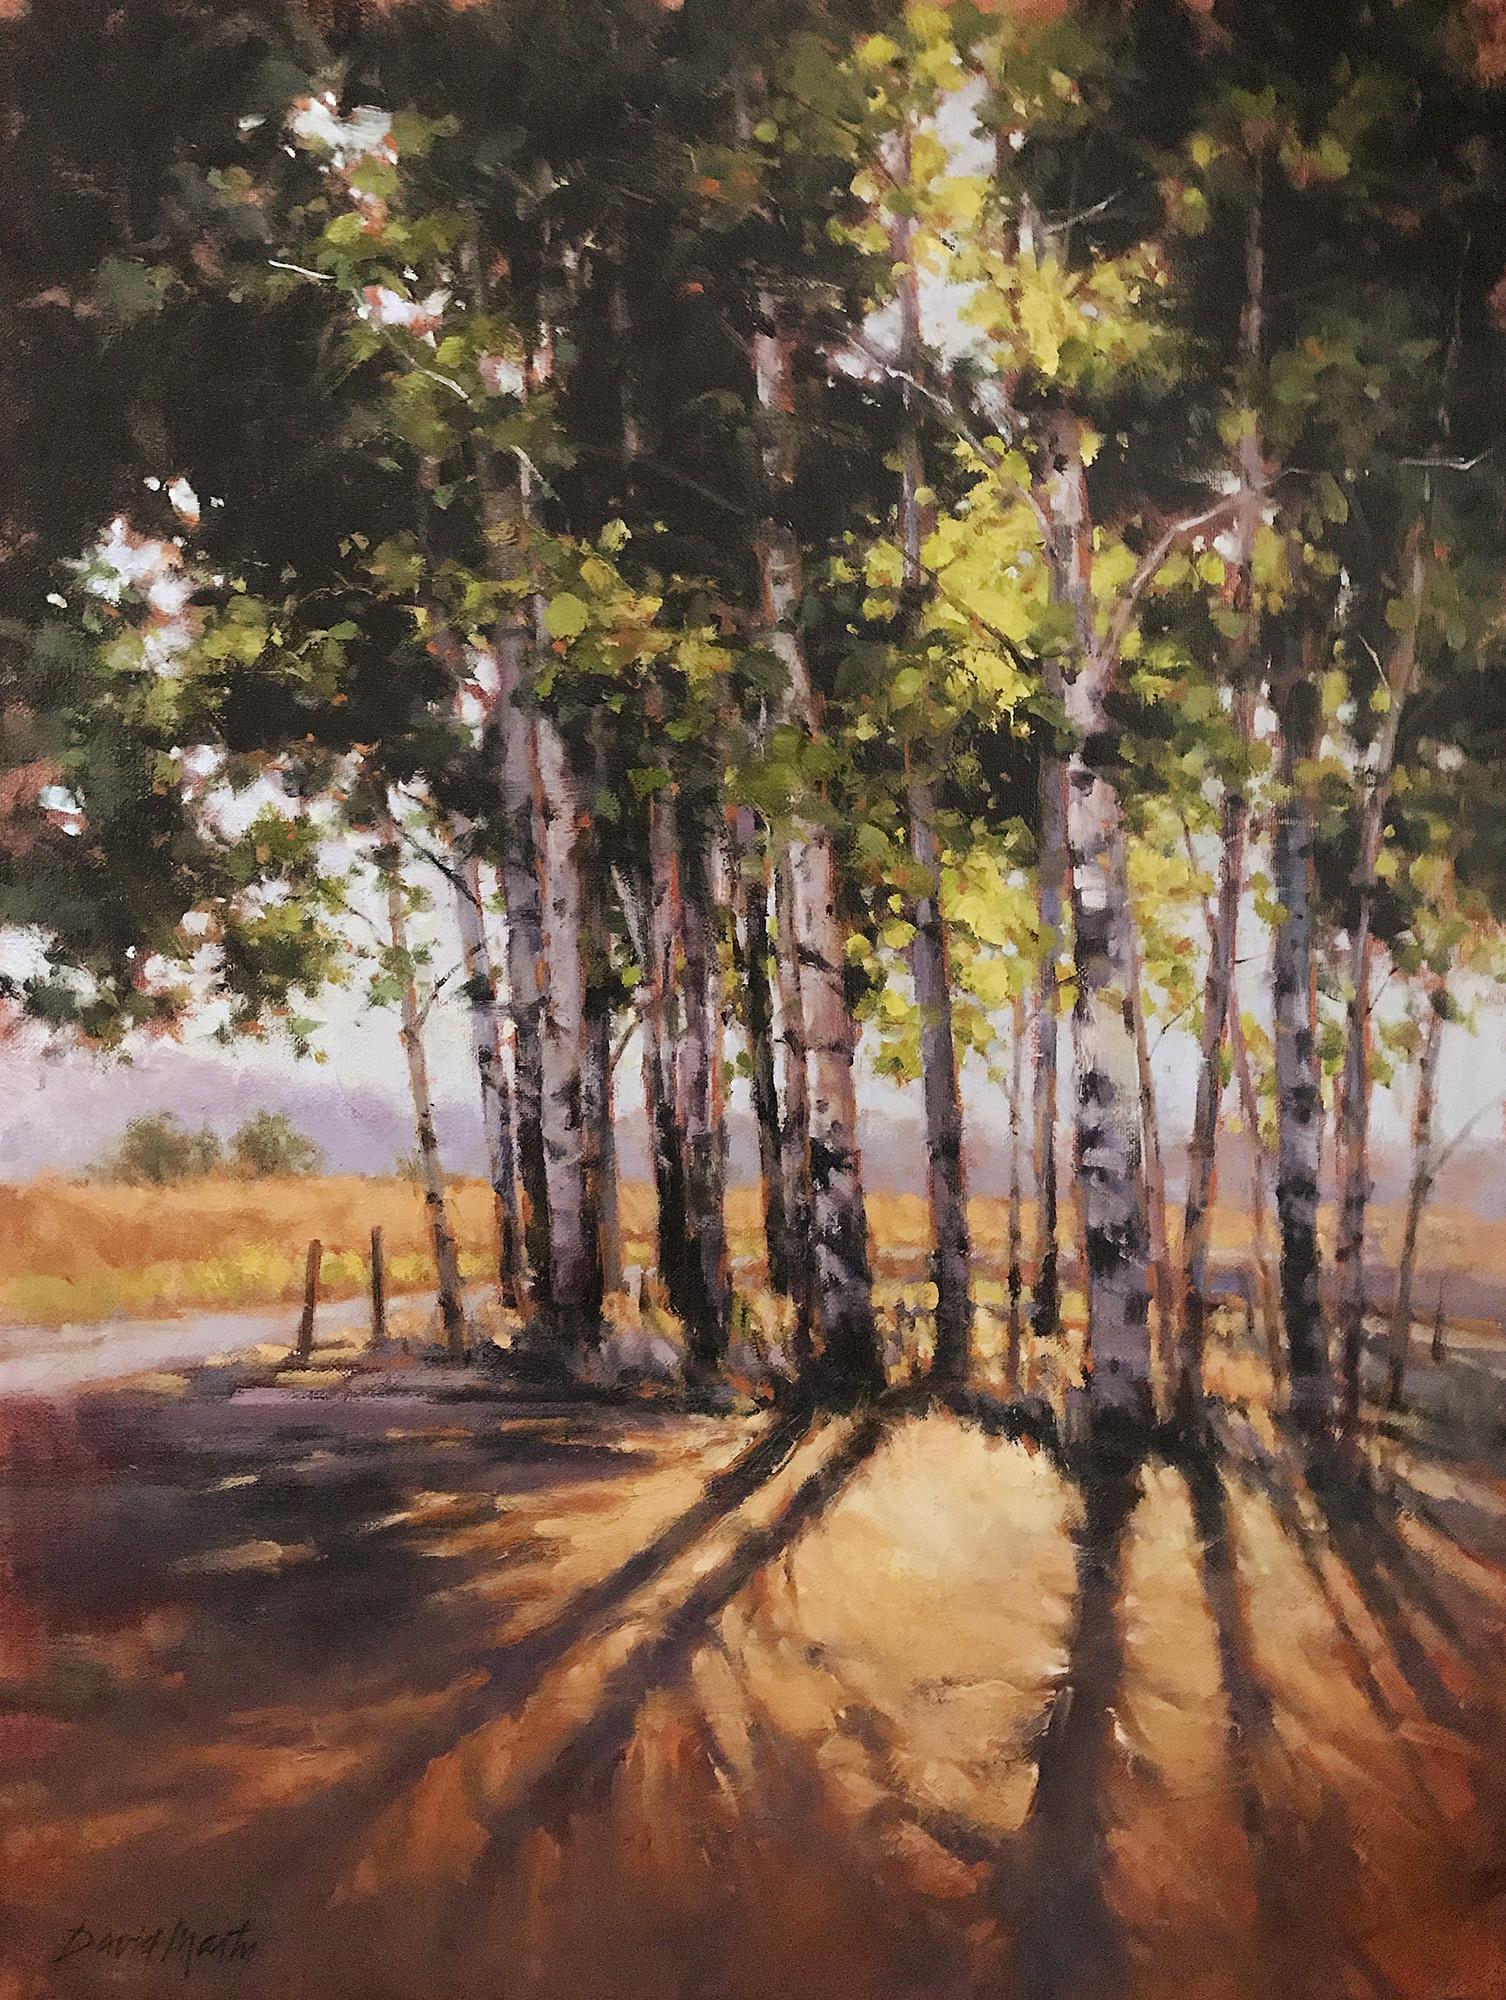 D_Marty_September Shadows_24x18_2450.jpg